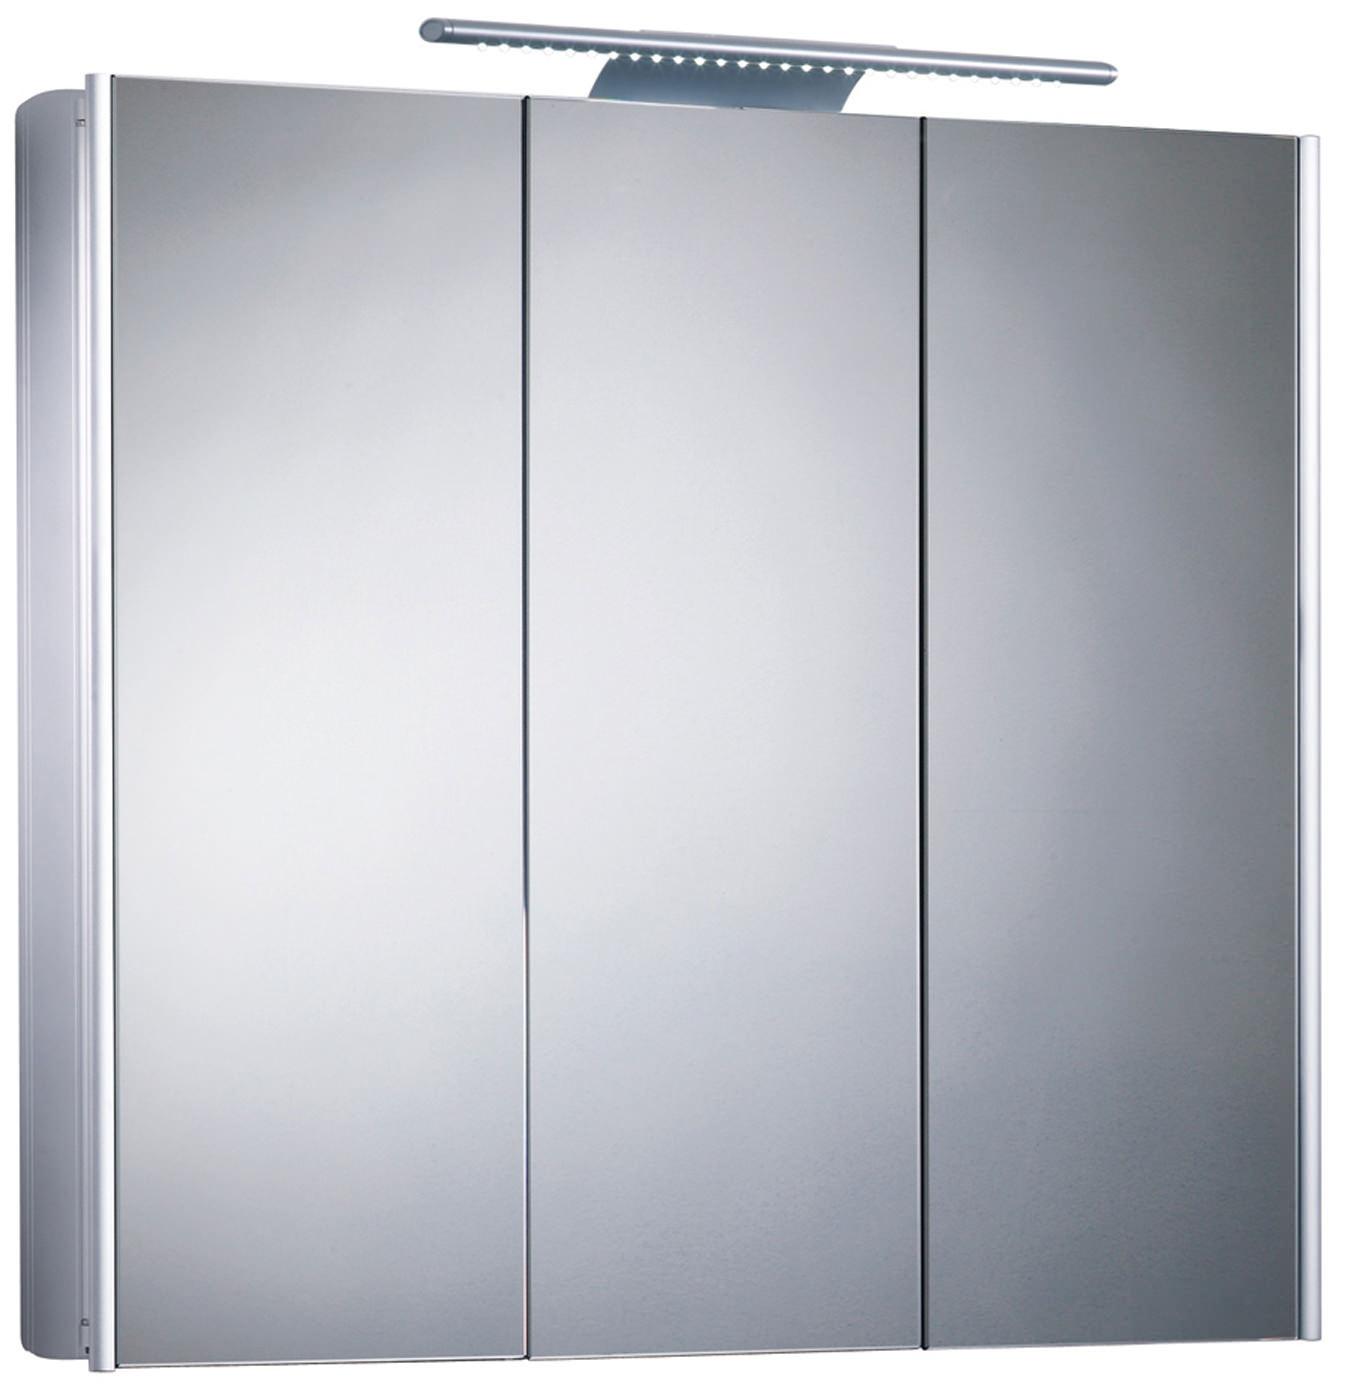 Roper Rhodes Ascension Absolute Triple Mirror Door Cabinet 767mm